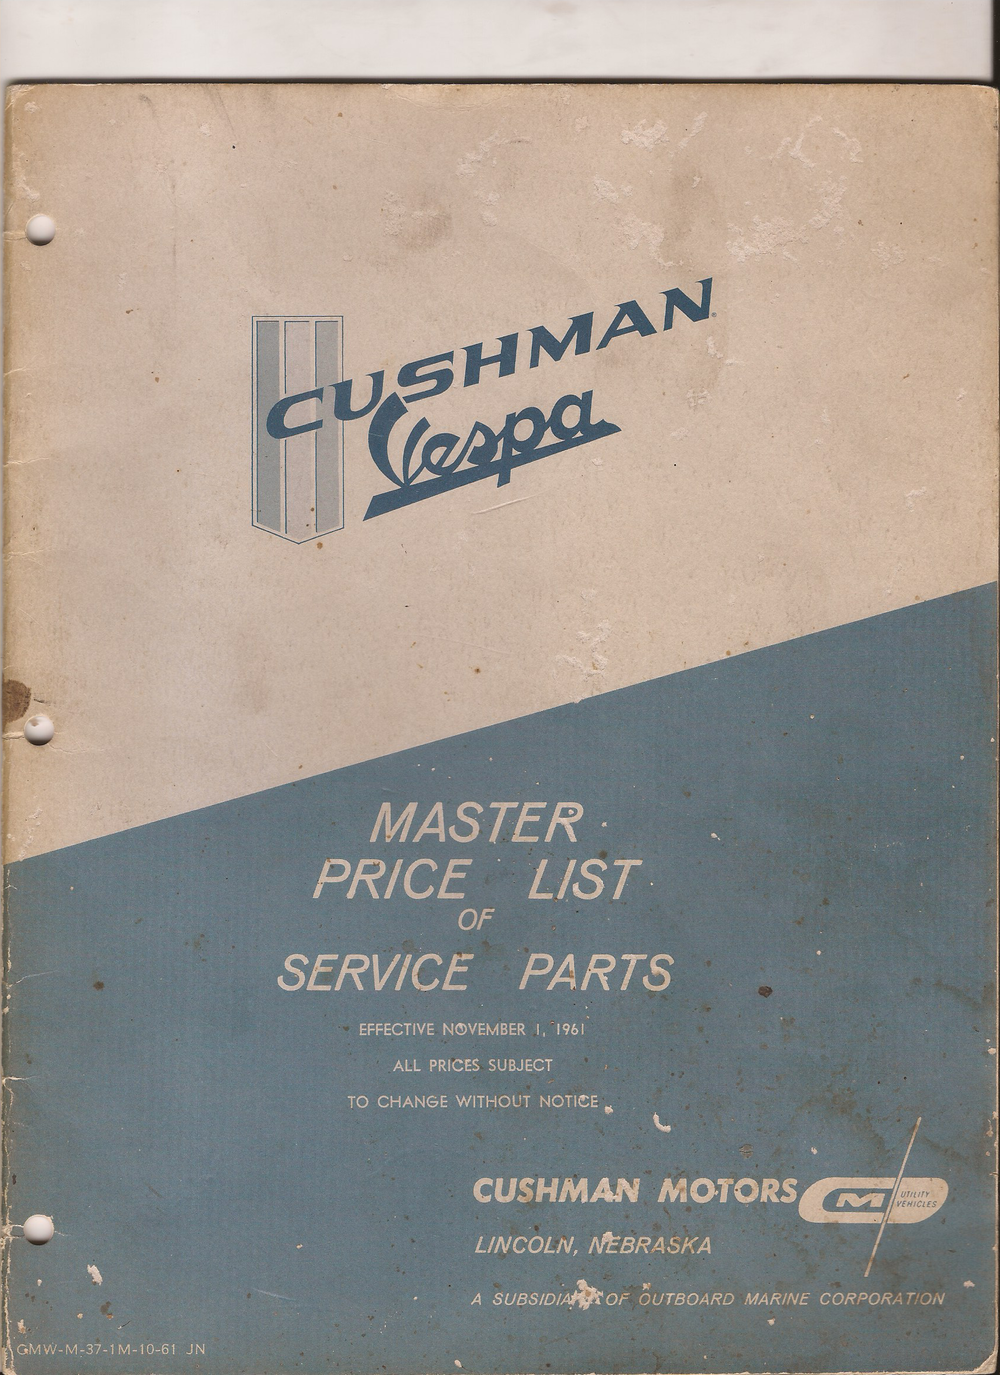 02-04-2016 Cushman Vespa Master parts list.png